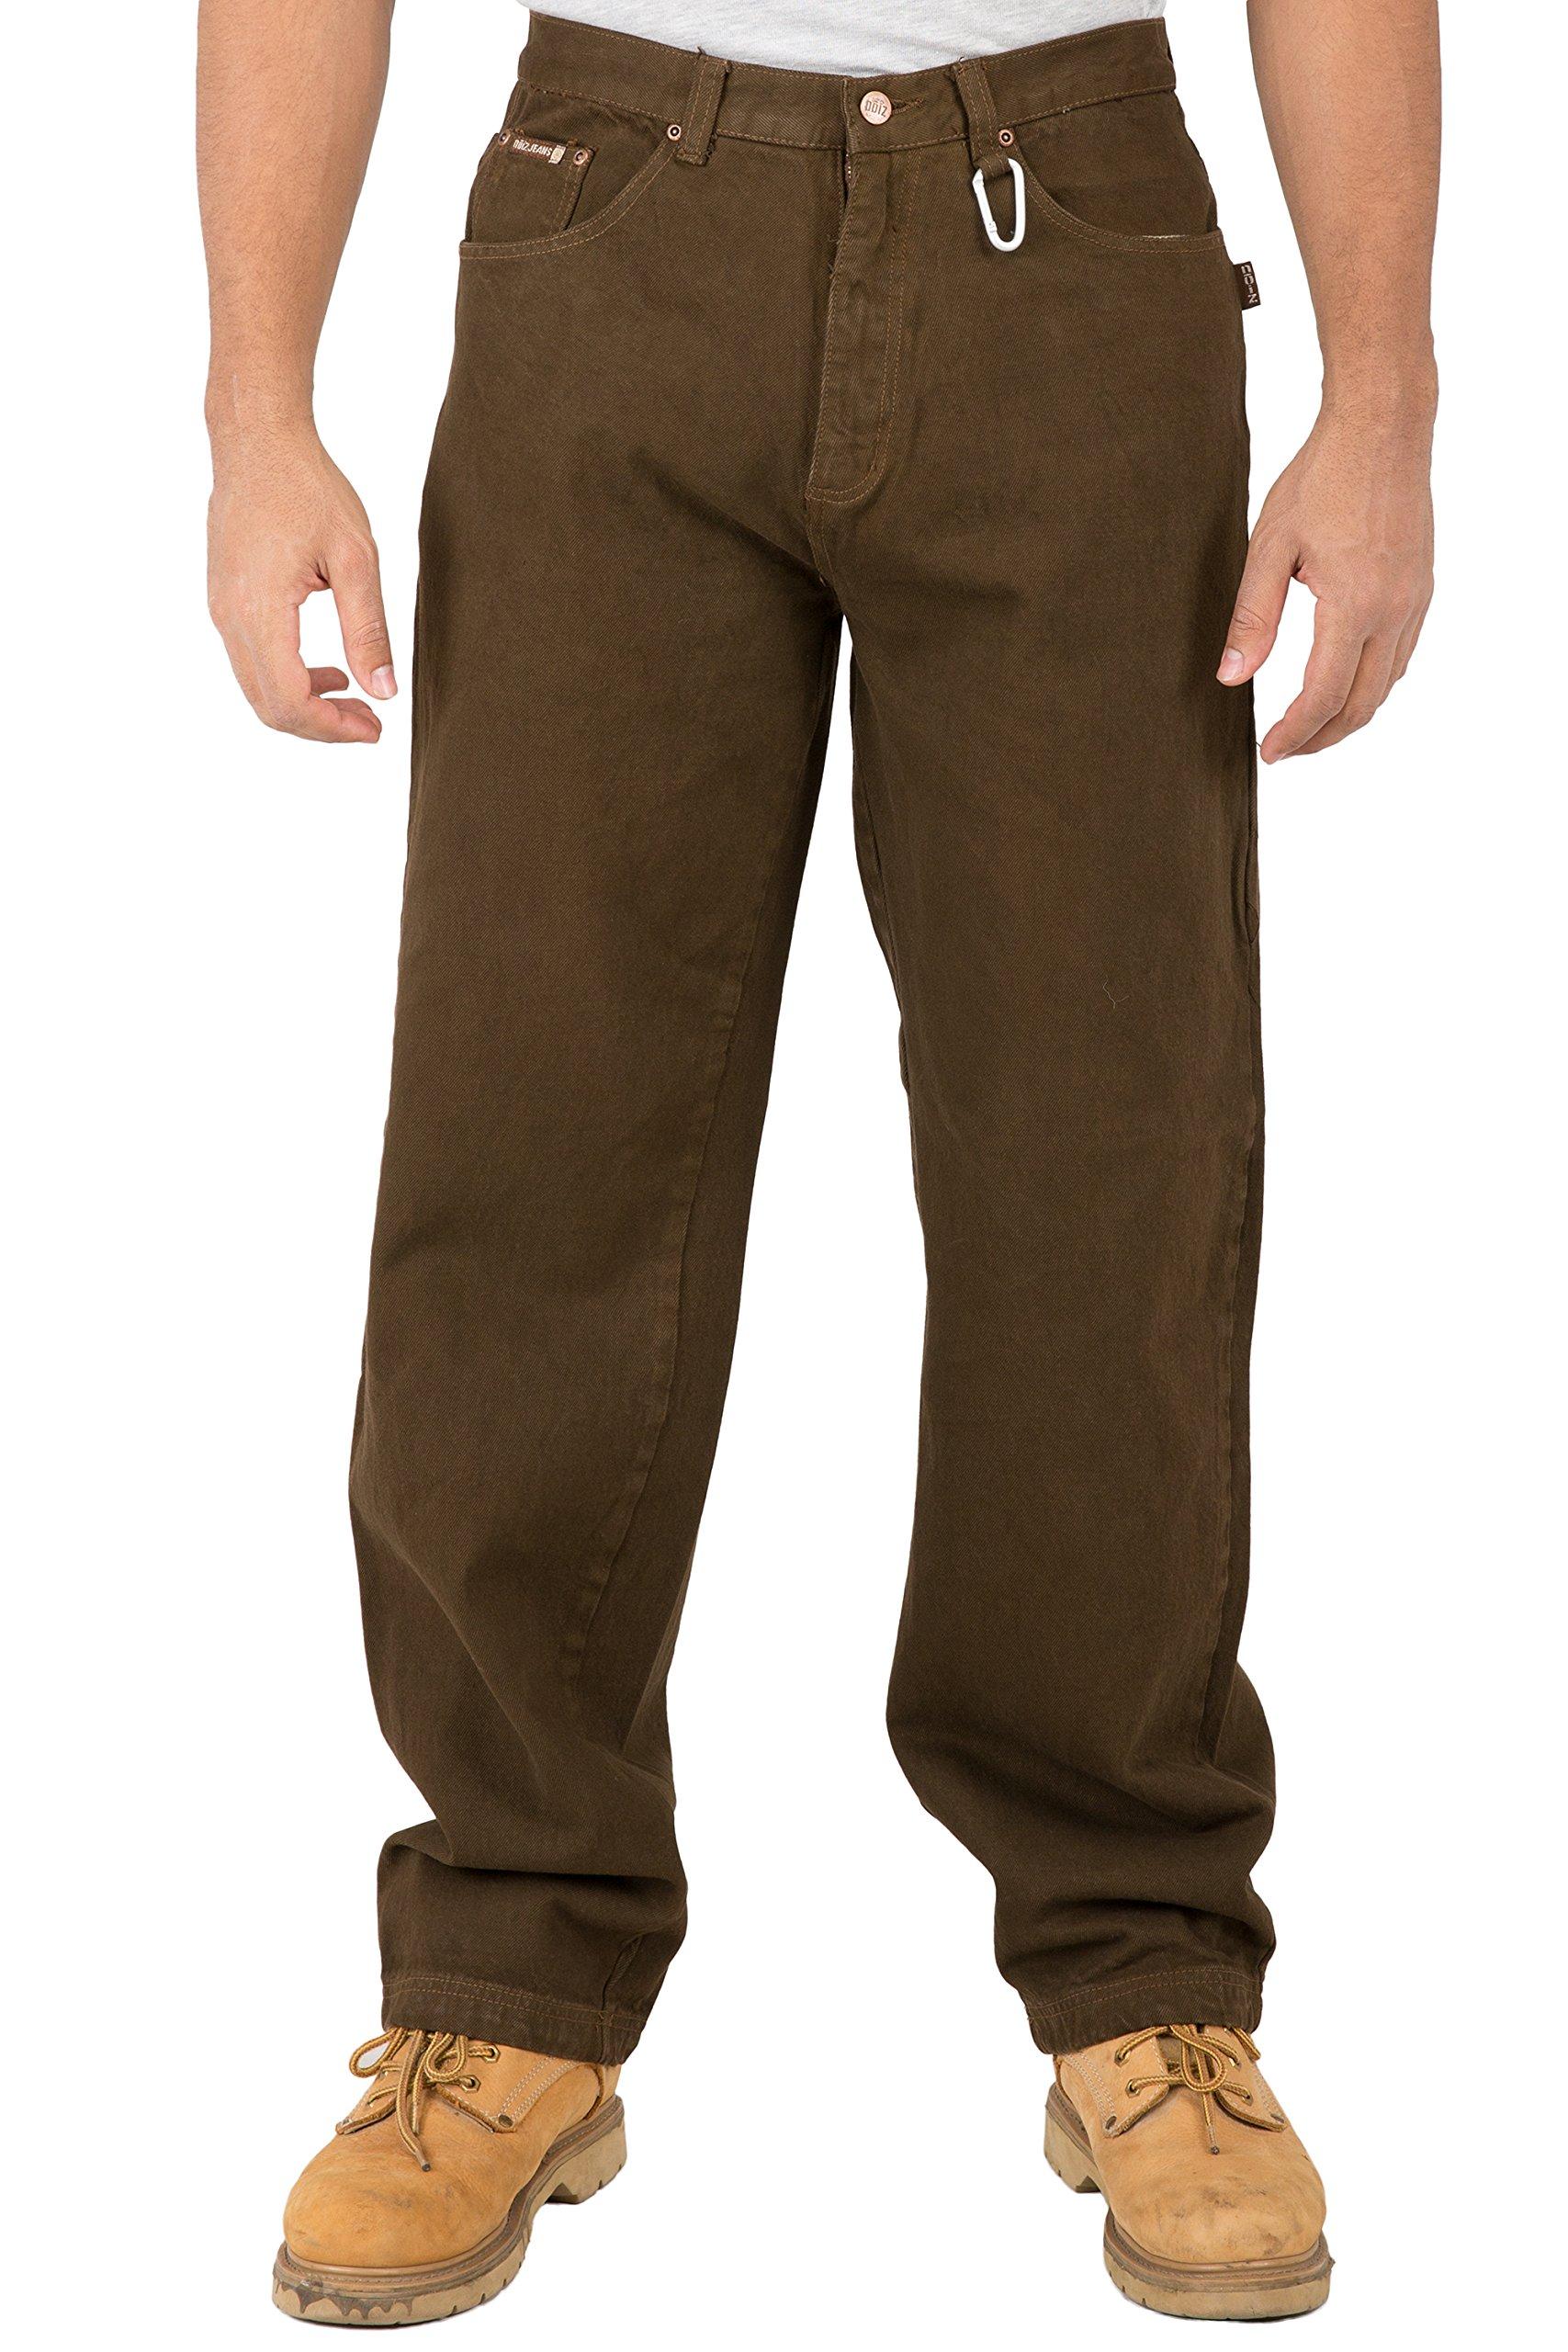 Vibes Mens Relax Straight Leg 5 Pocket Brown Color Denim Jeans Carabiner Clips On Belt Loop Size 44